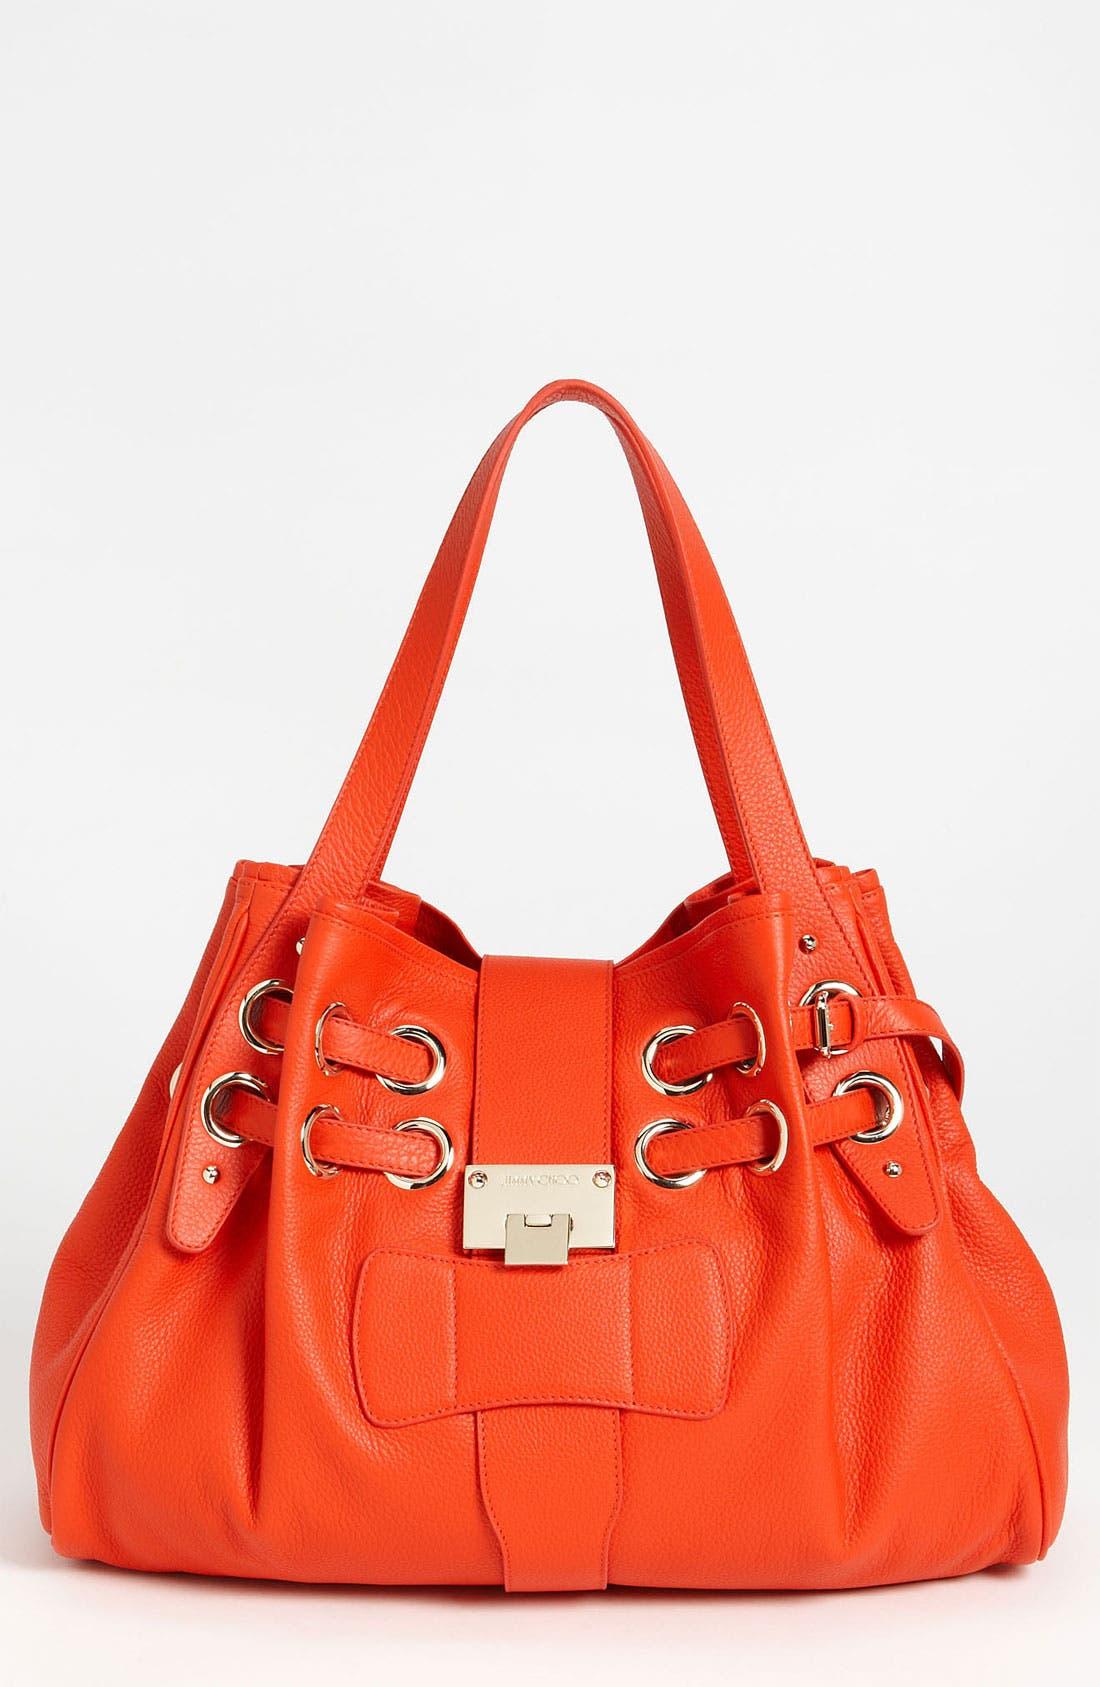 Main Image - Jimmy Choo 'Ramona' Leather Shopper